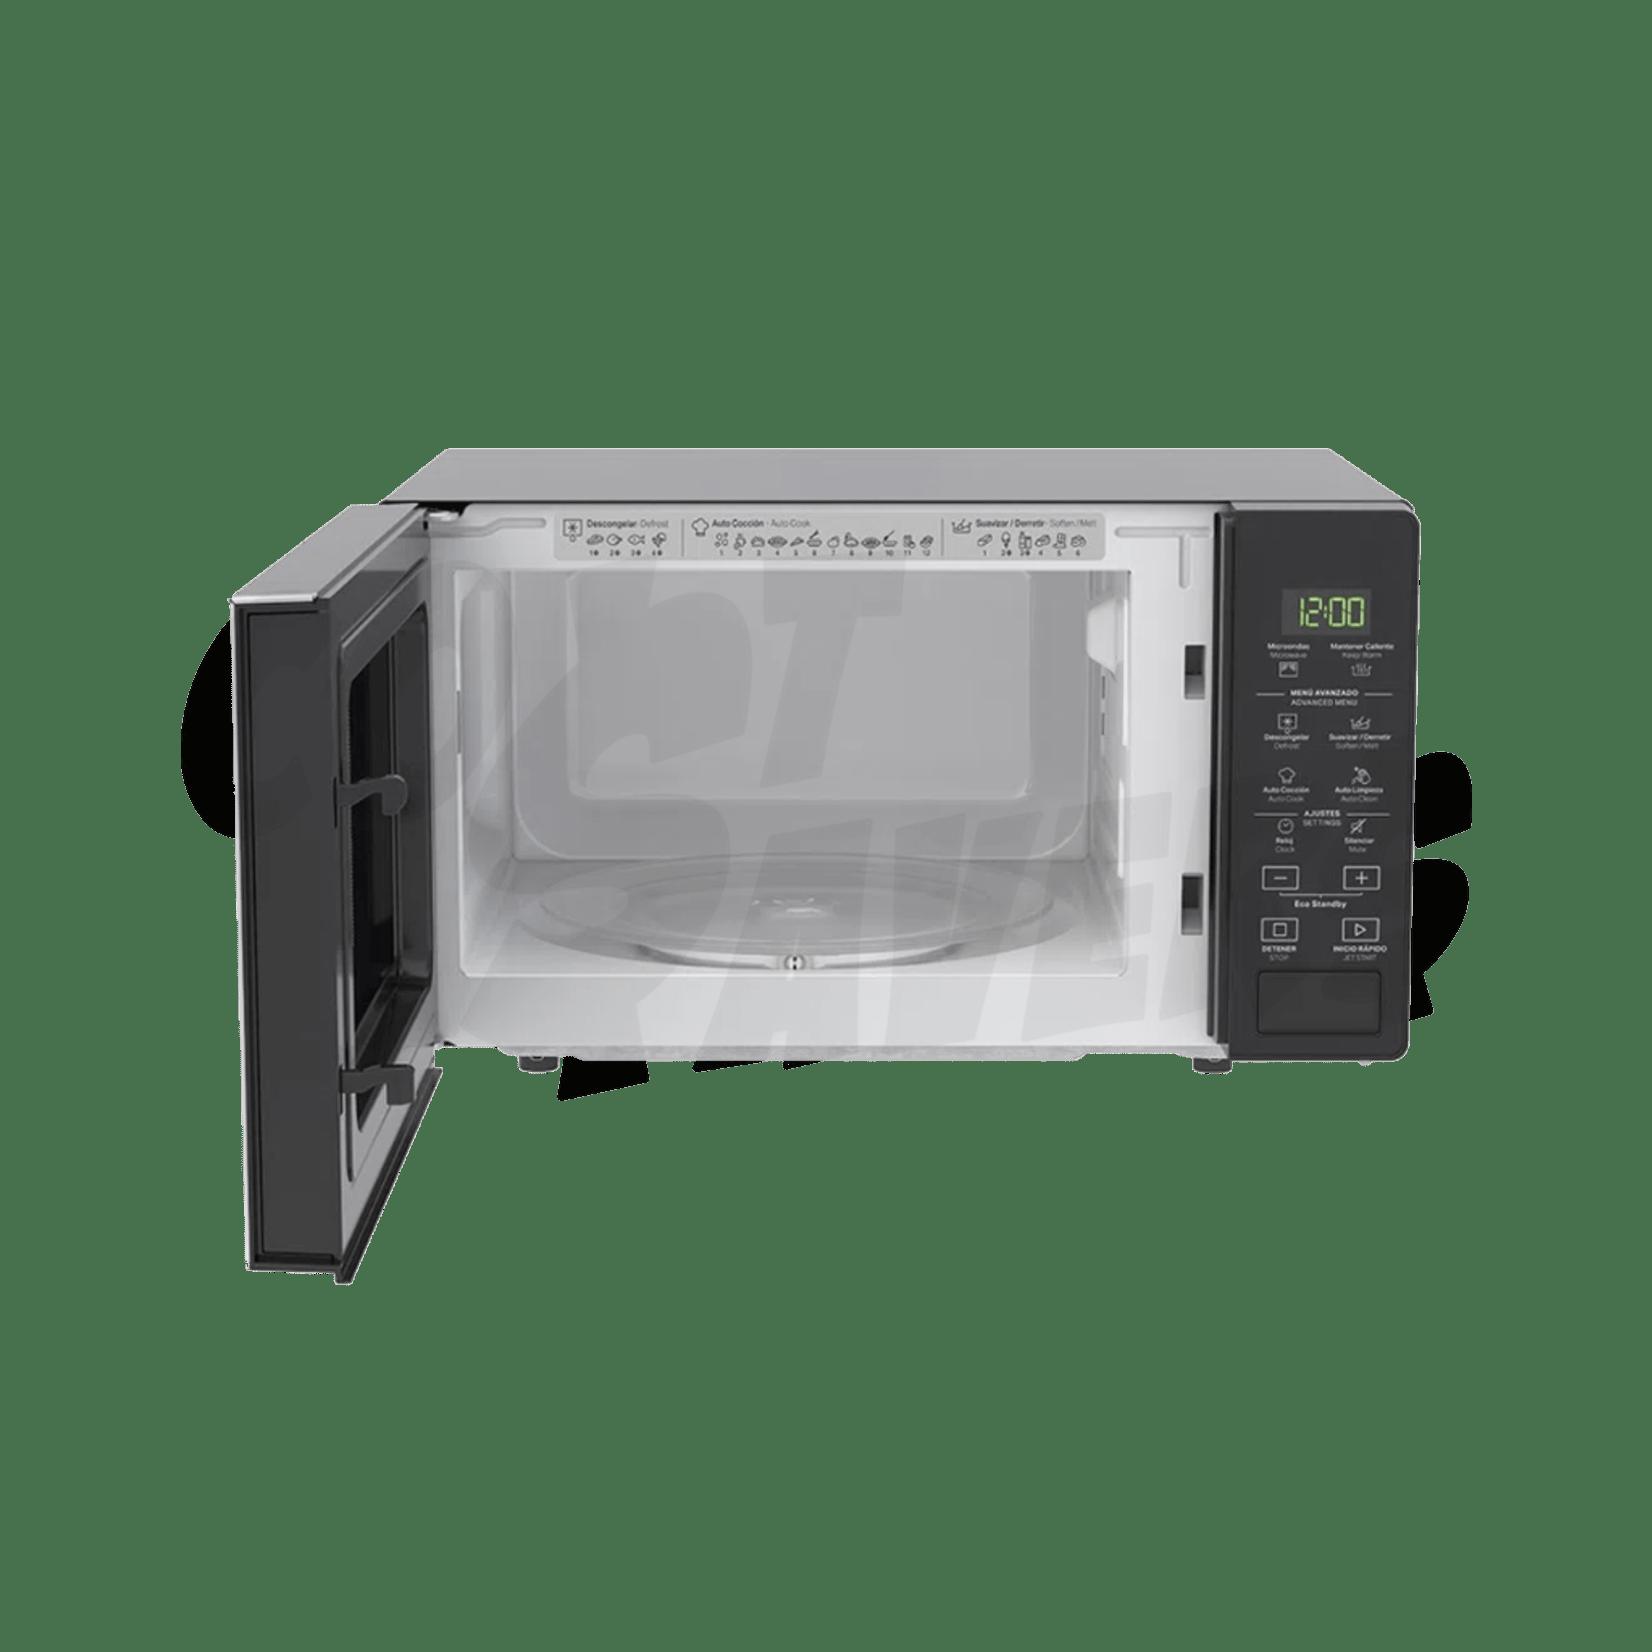 whirlpool whirlpool 0 7 cu ft microwave black